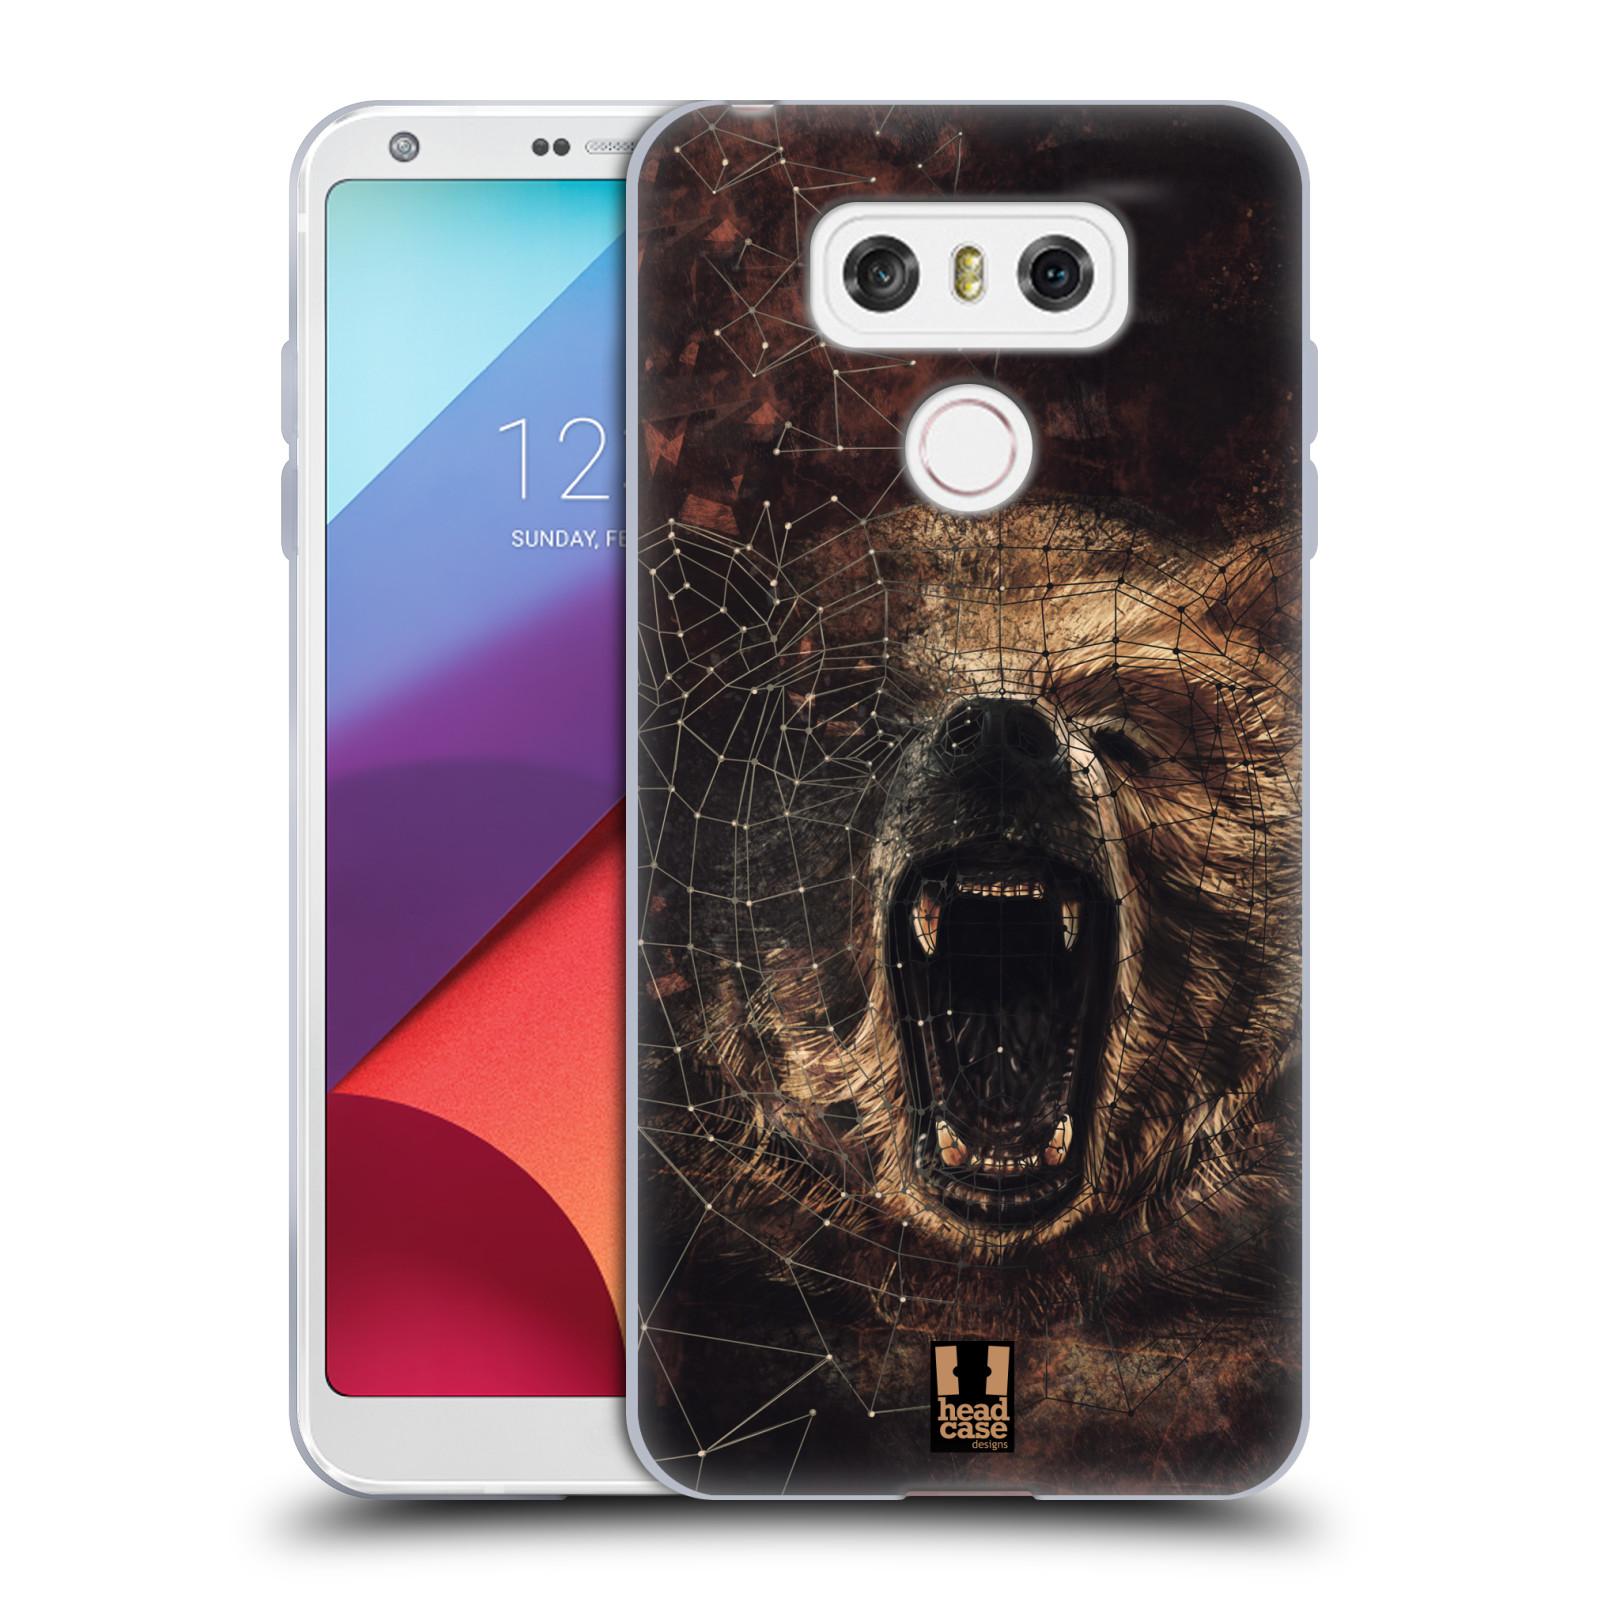 Silikonové pouzdro na mobil LG G6 - Head Case POLYSKETCH GRIZZLY (Silikonový kryt či obal na mobilní telefon LG G6 H870 / LG G6 Dual SIM H870DS)